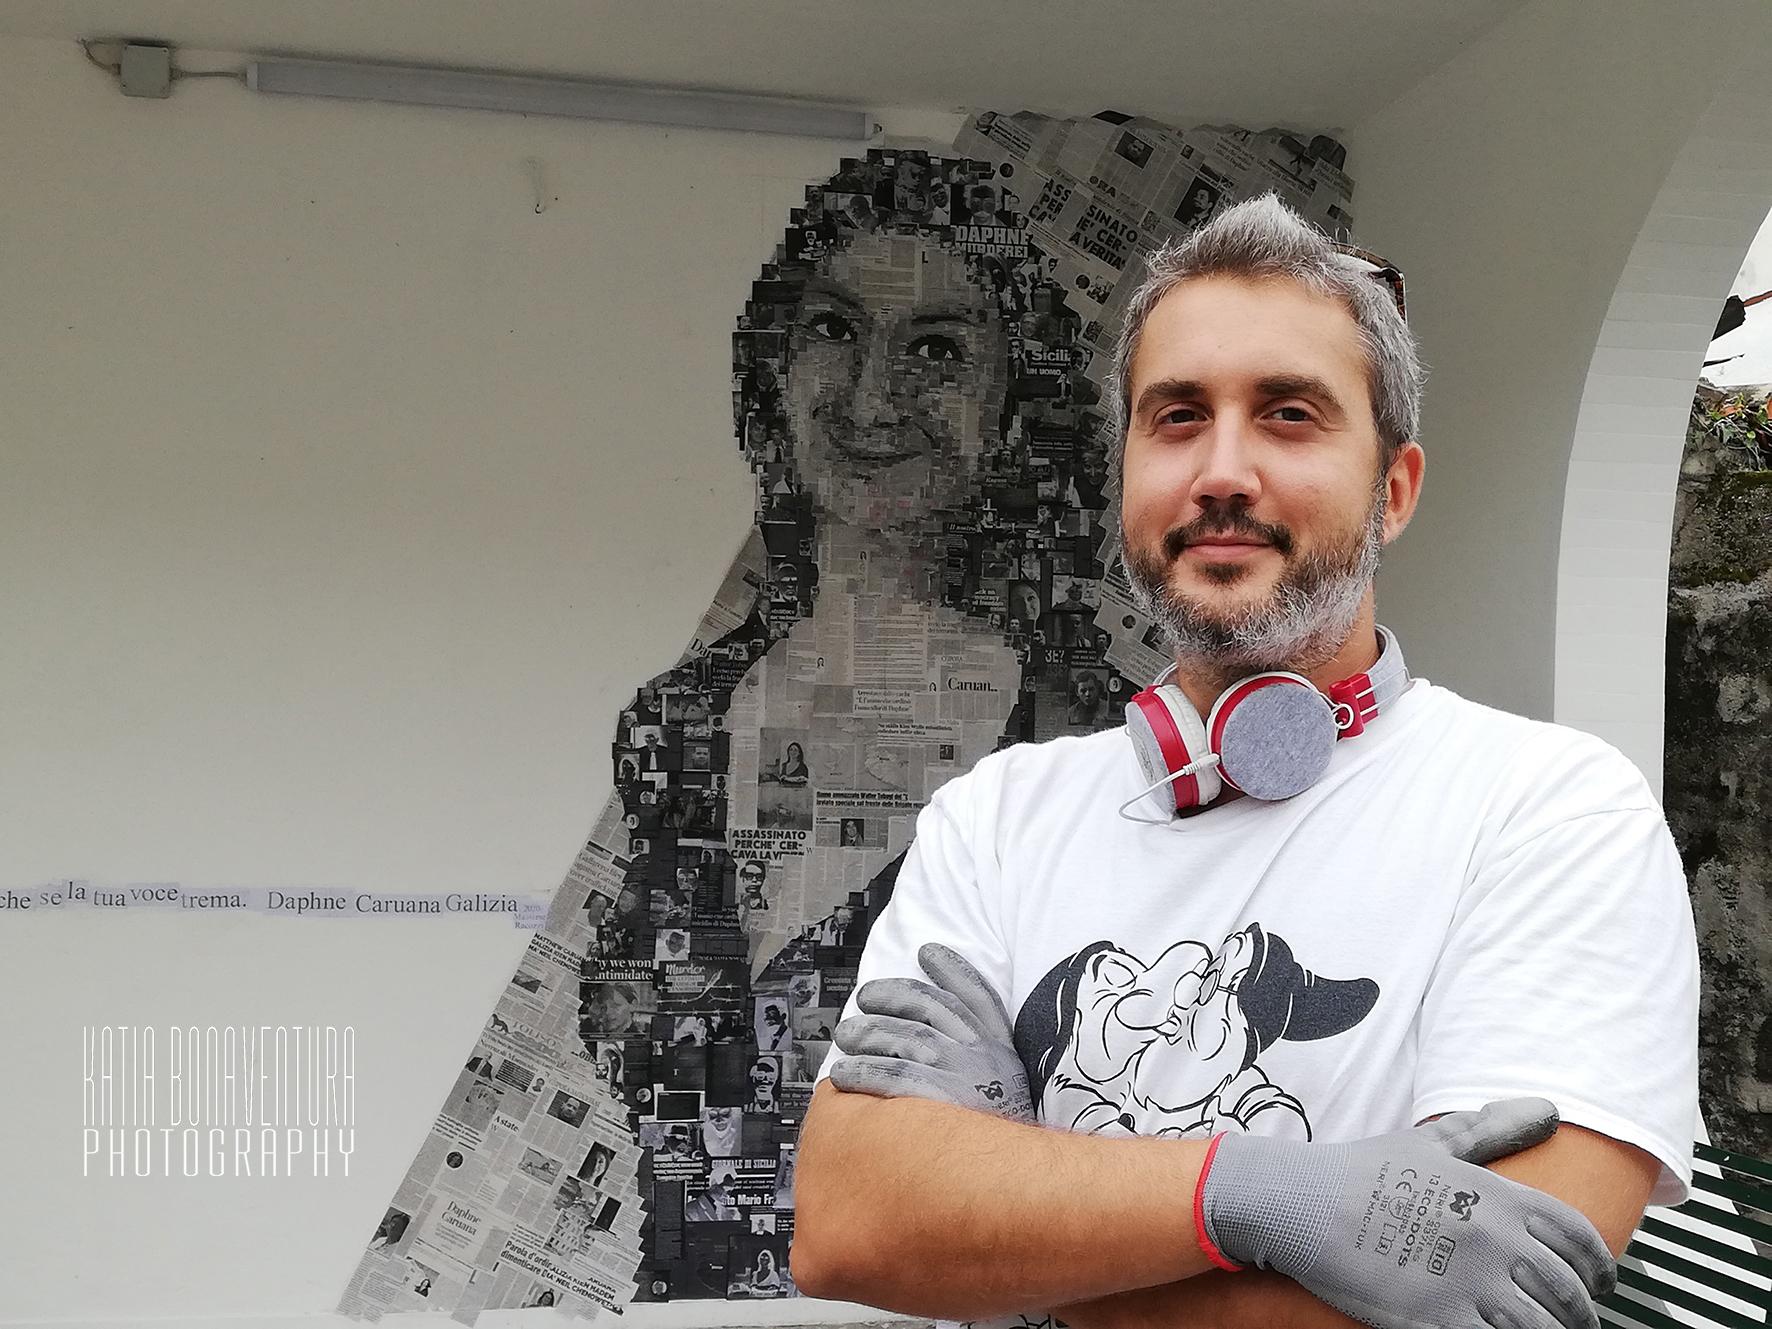 Murales Daphne Caruana Galizia (Ronchi dei Legionari)